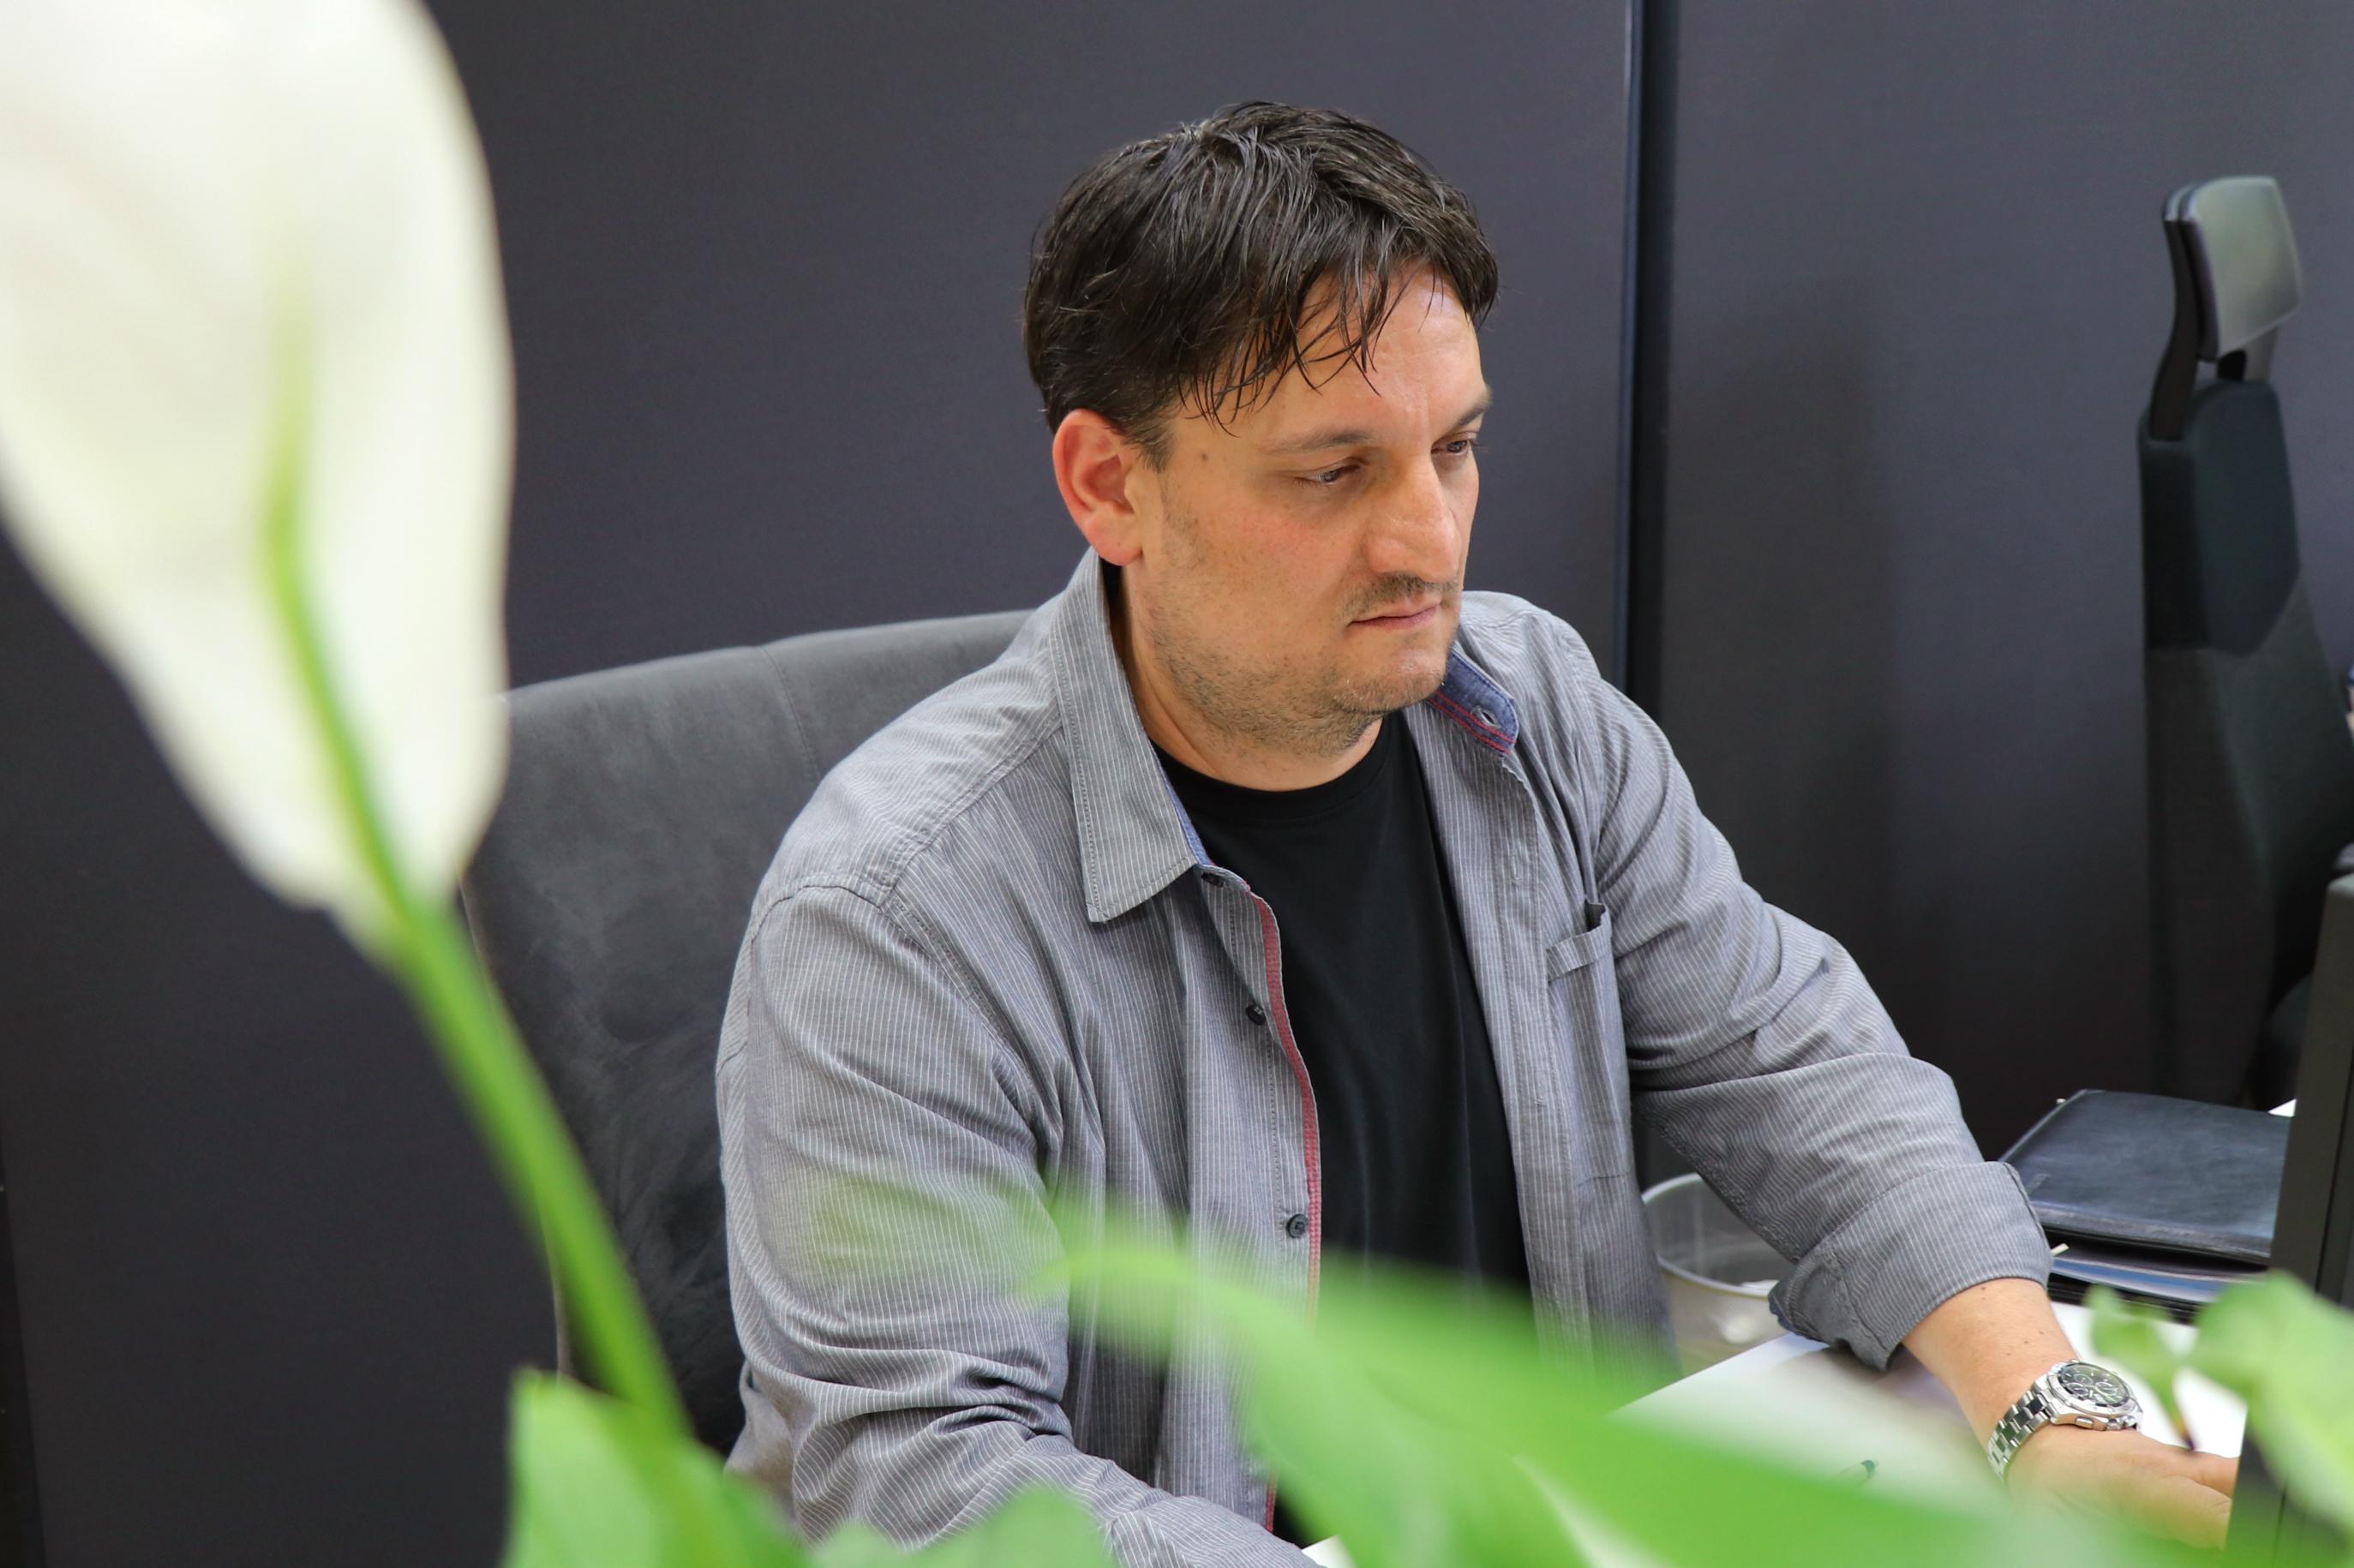 Maurizio Vodola